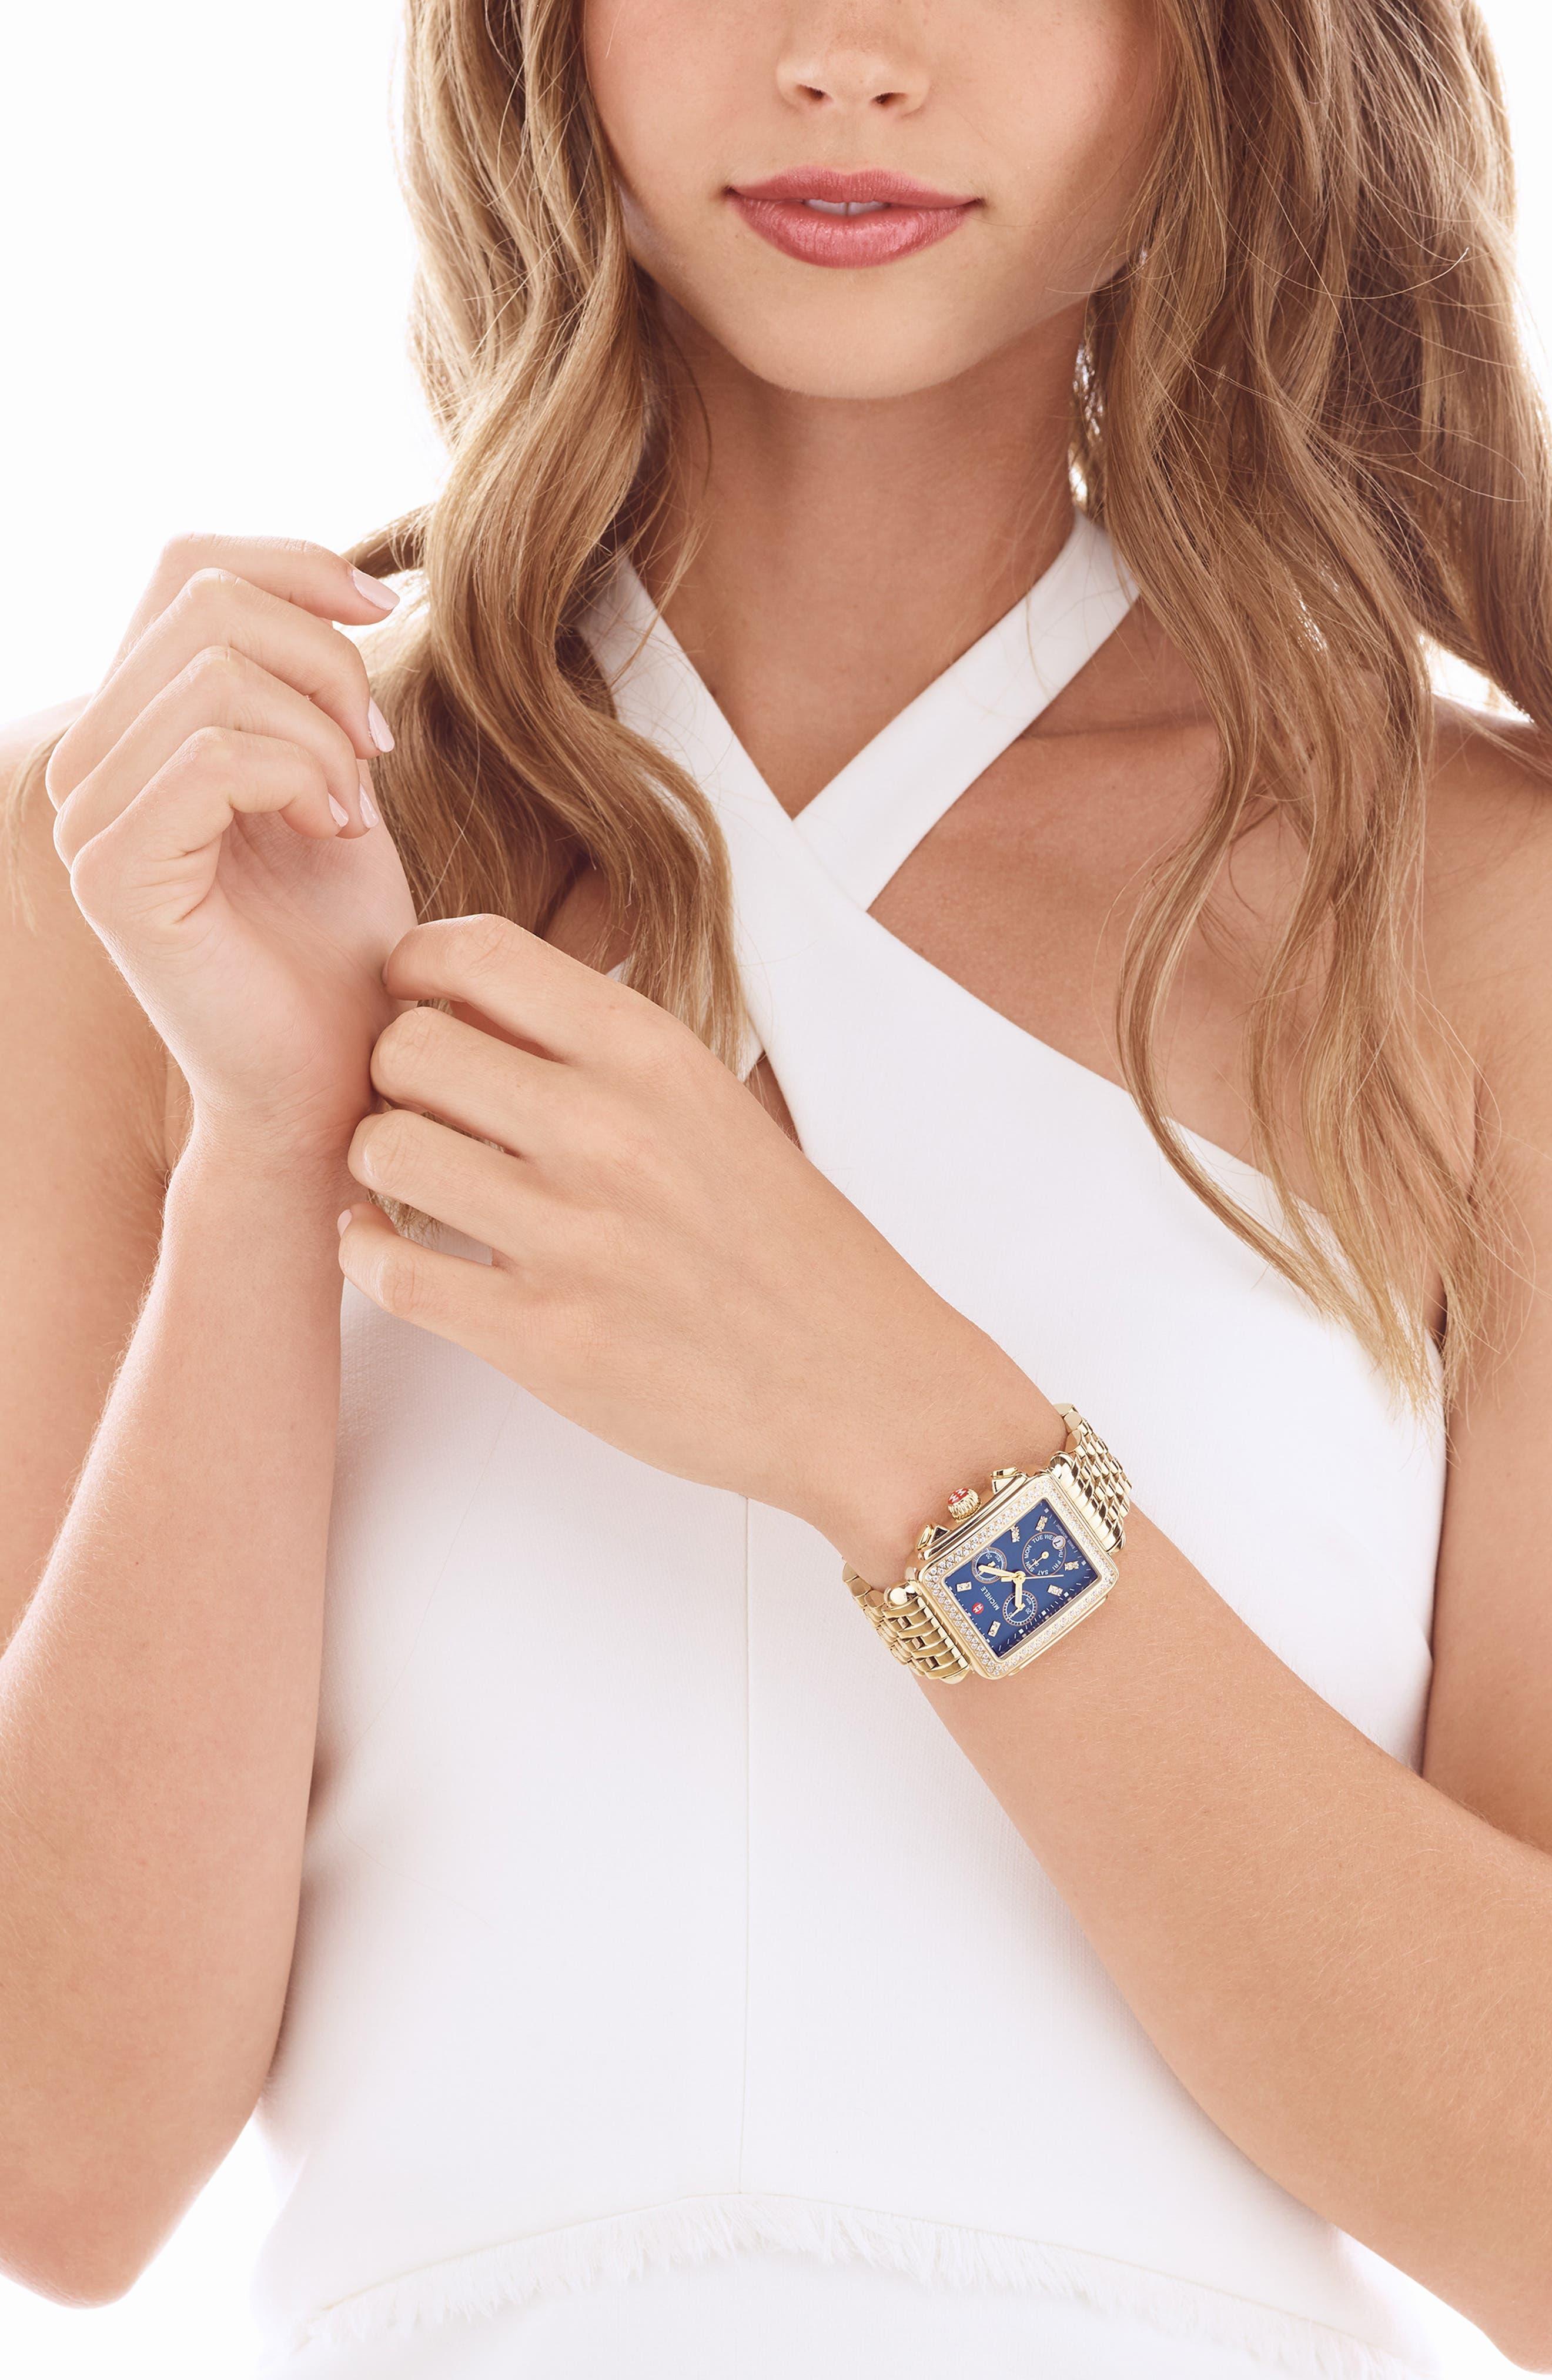 MICHELE, Deco Diamond Diamond Dial Watch Head, 33mm x 35mm, Alternate thumbnail 2, color, GOLD/ DEEP BLUE MOP